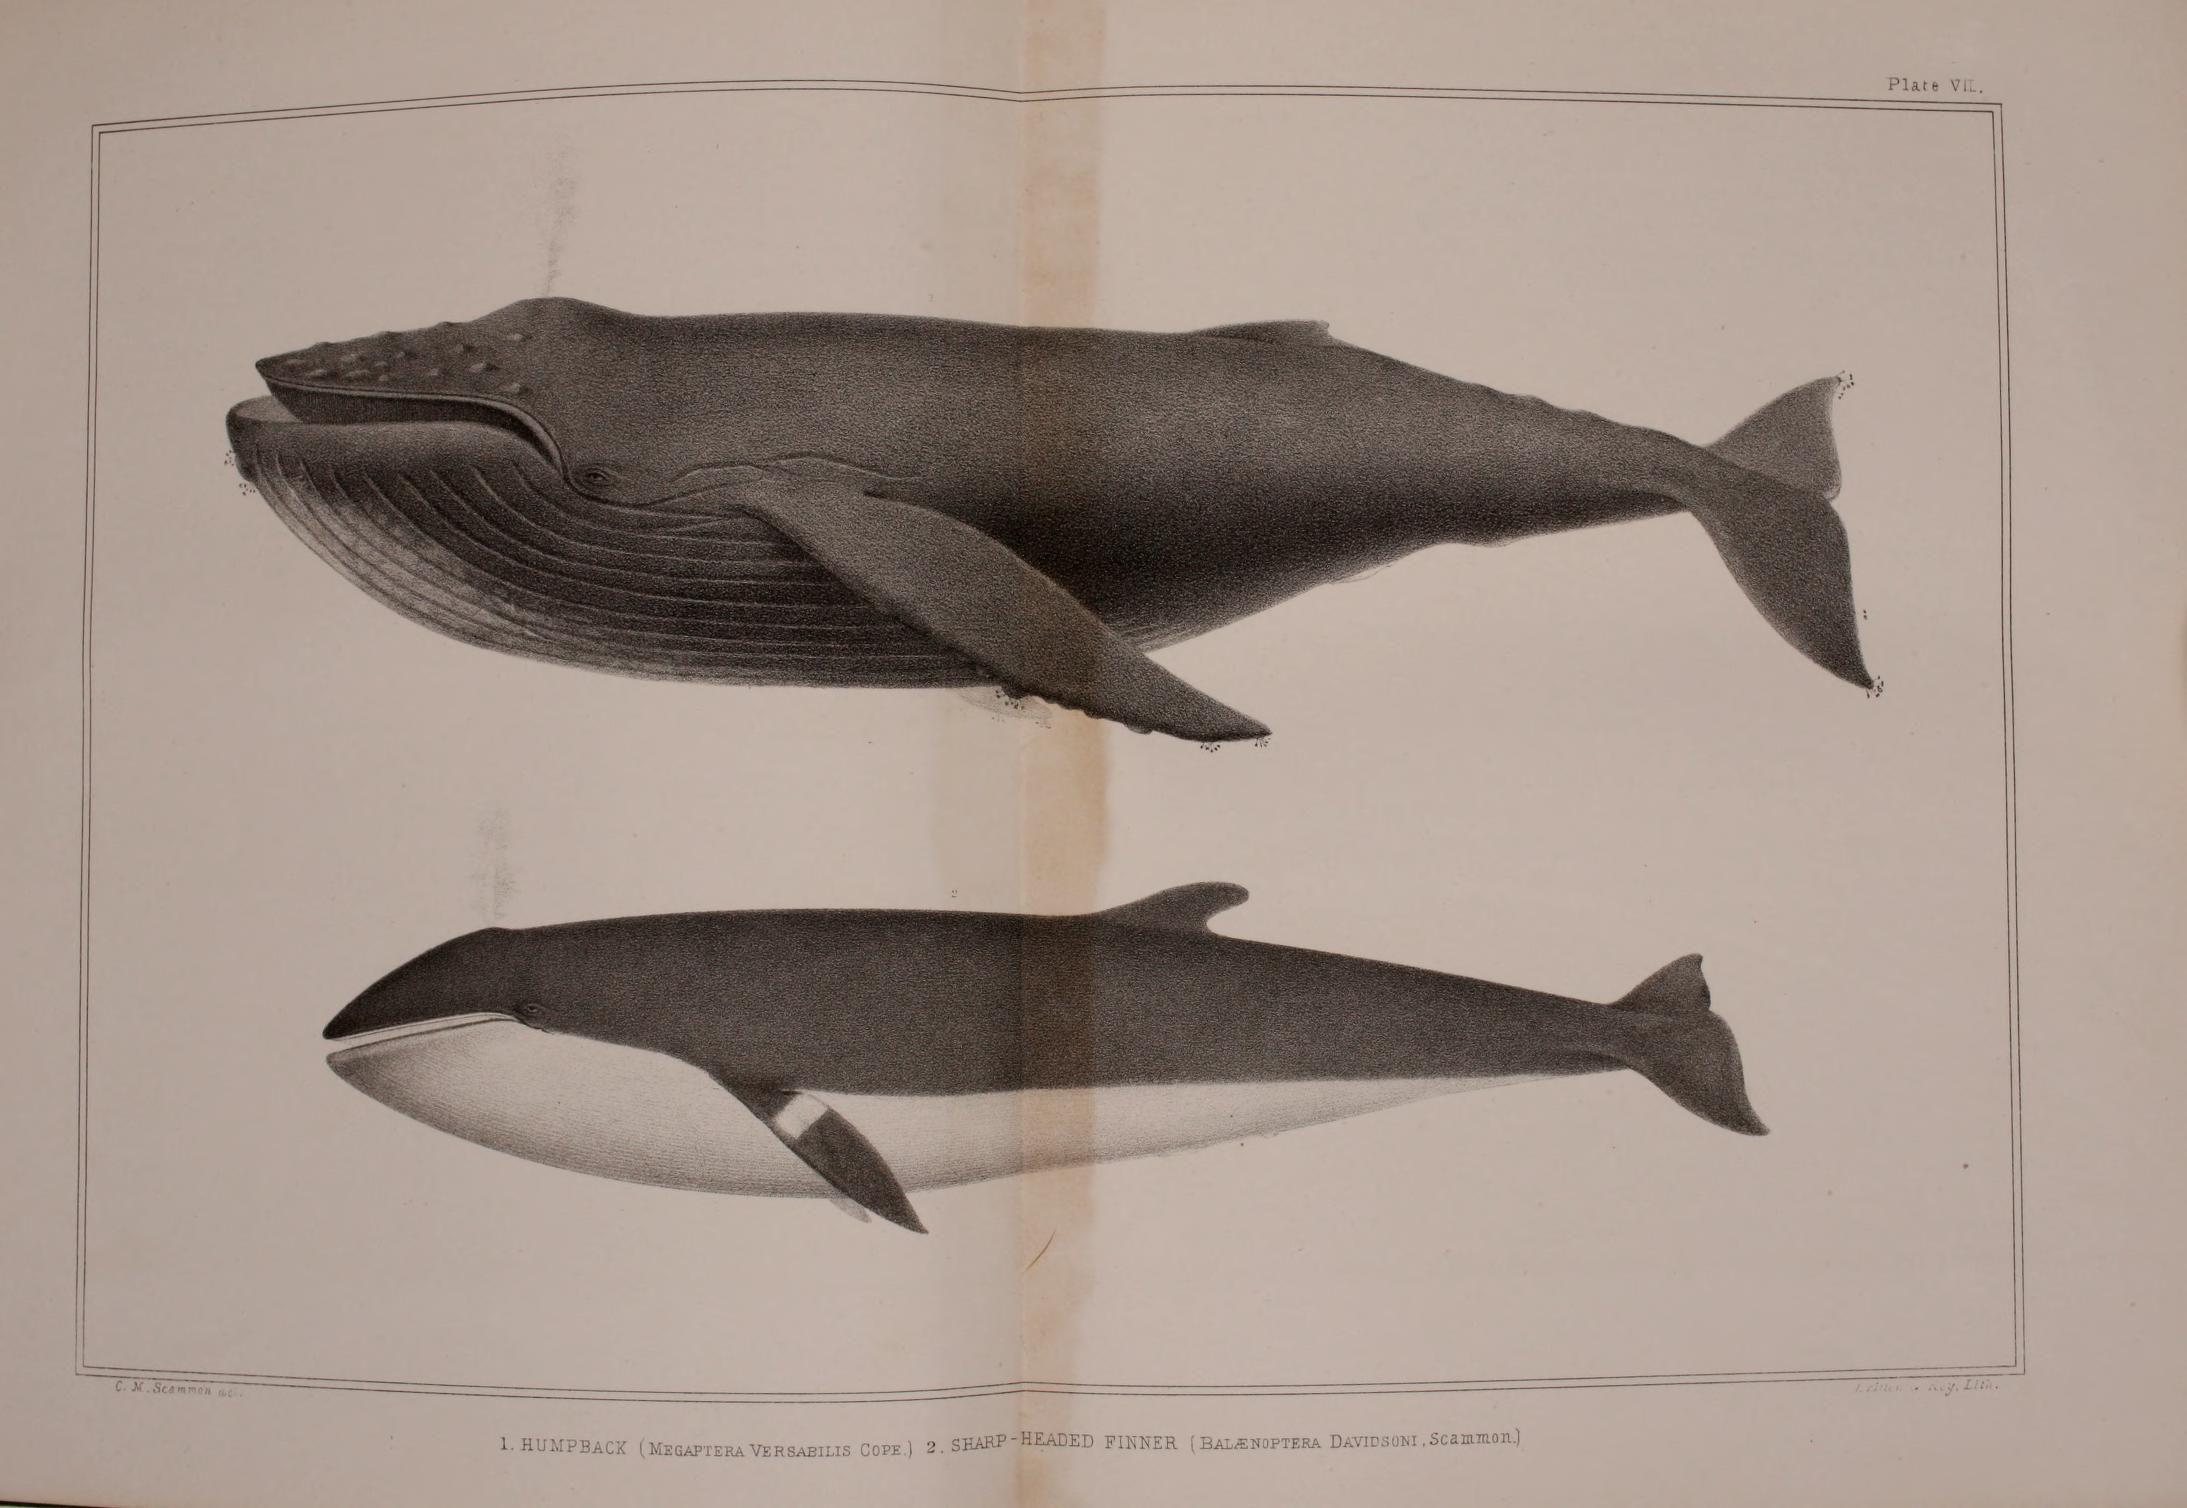 Humpback, Sharp-Headed Finner. The marine mammals of the north ...